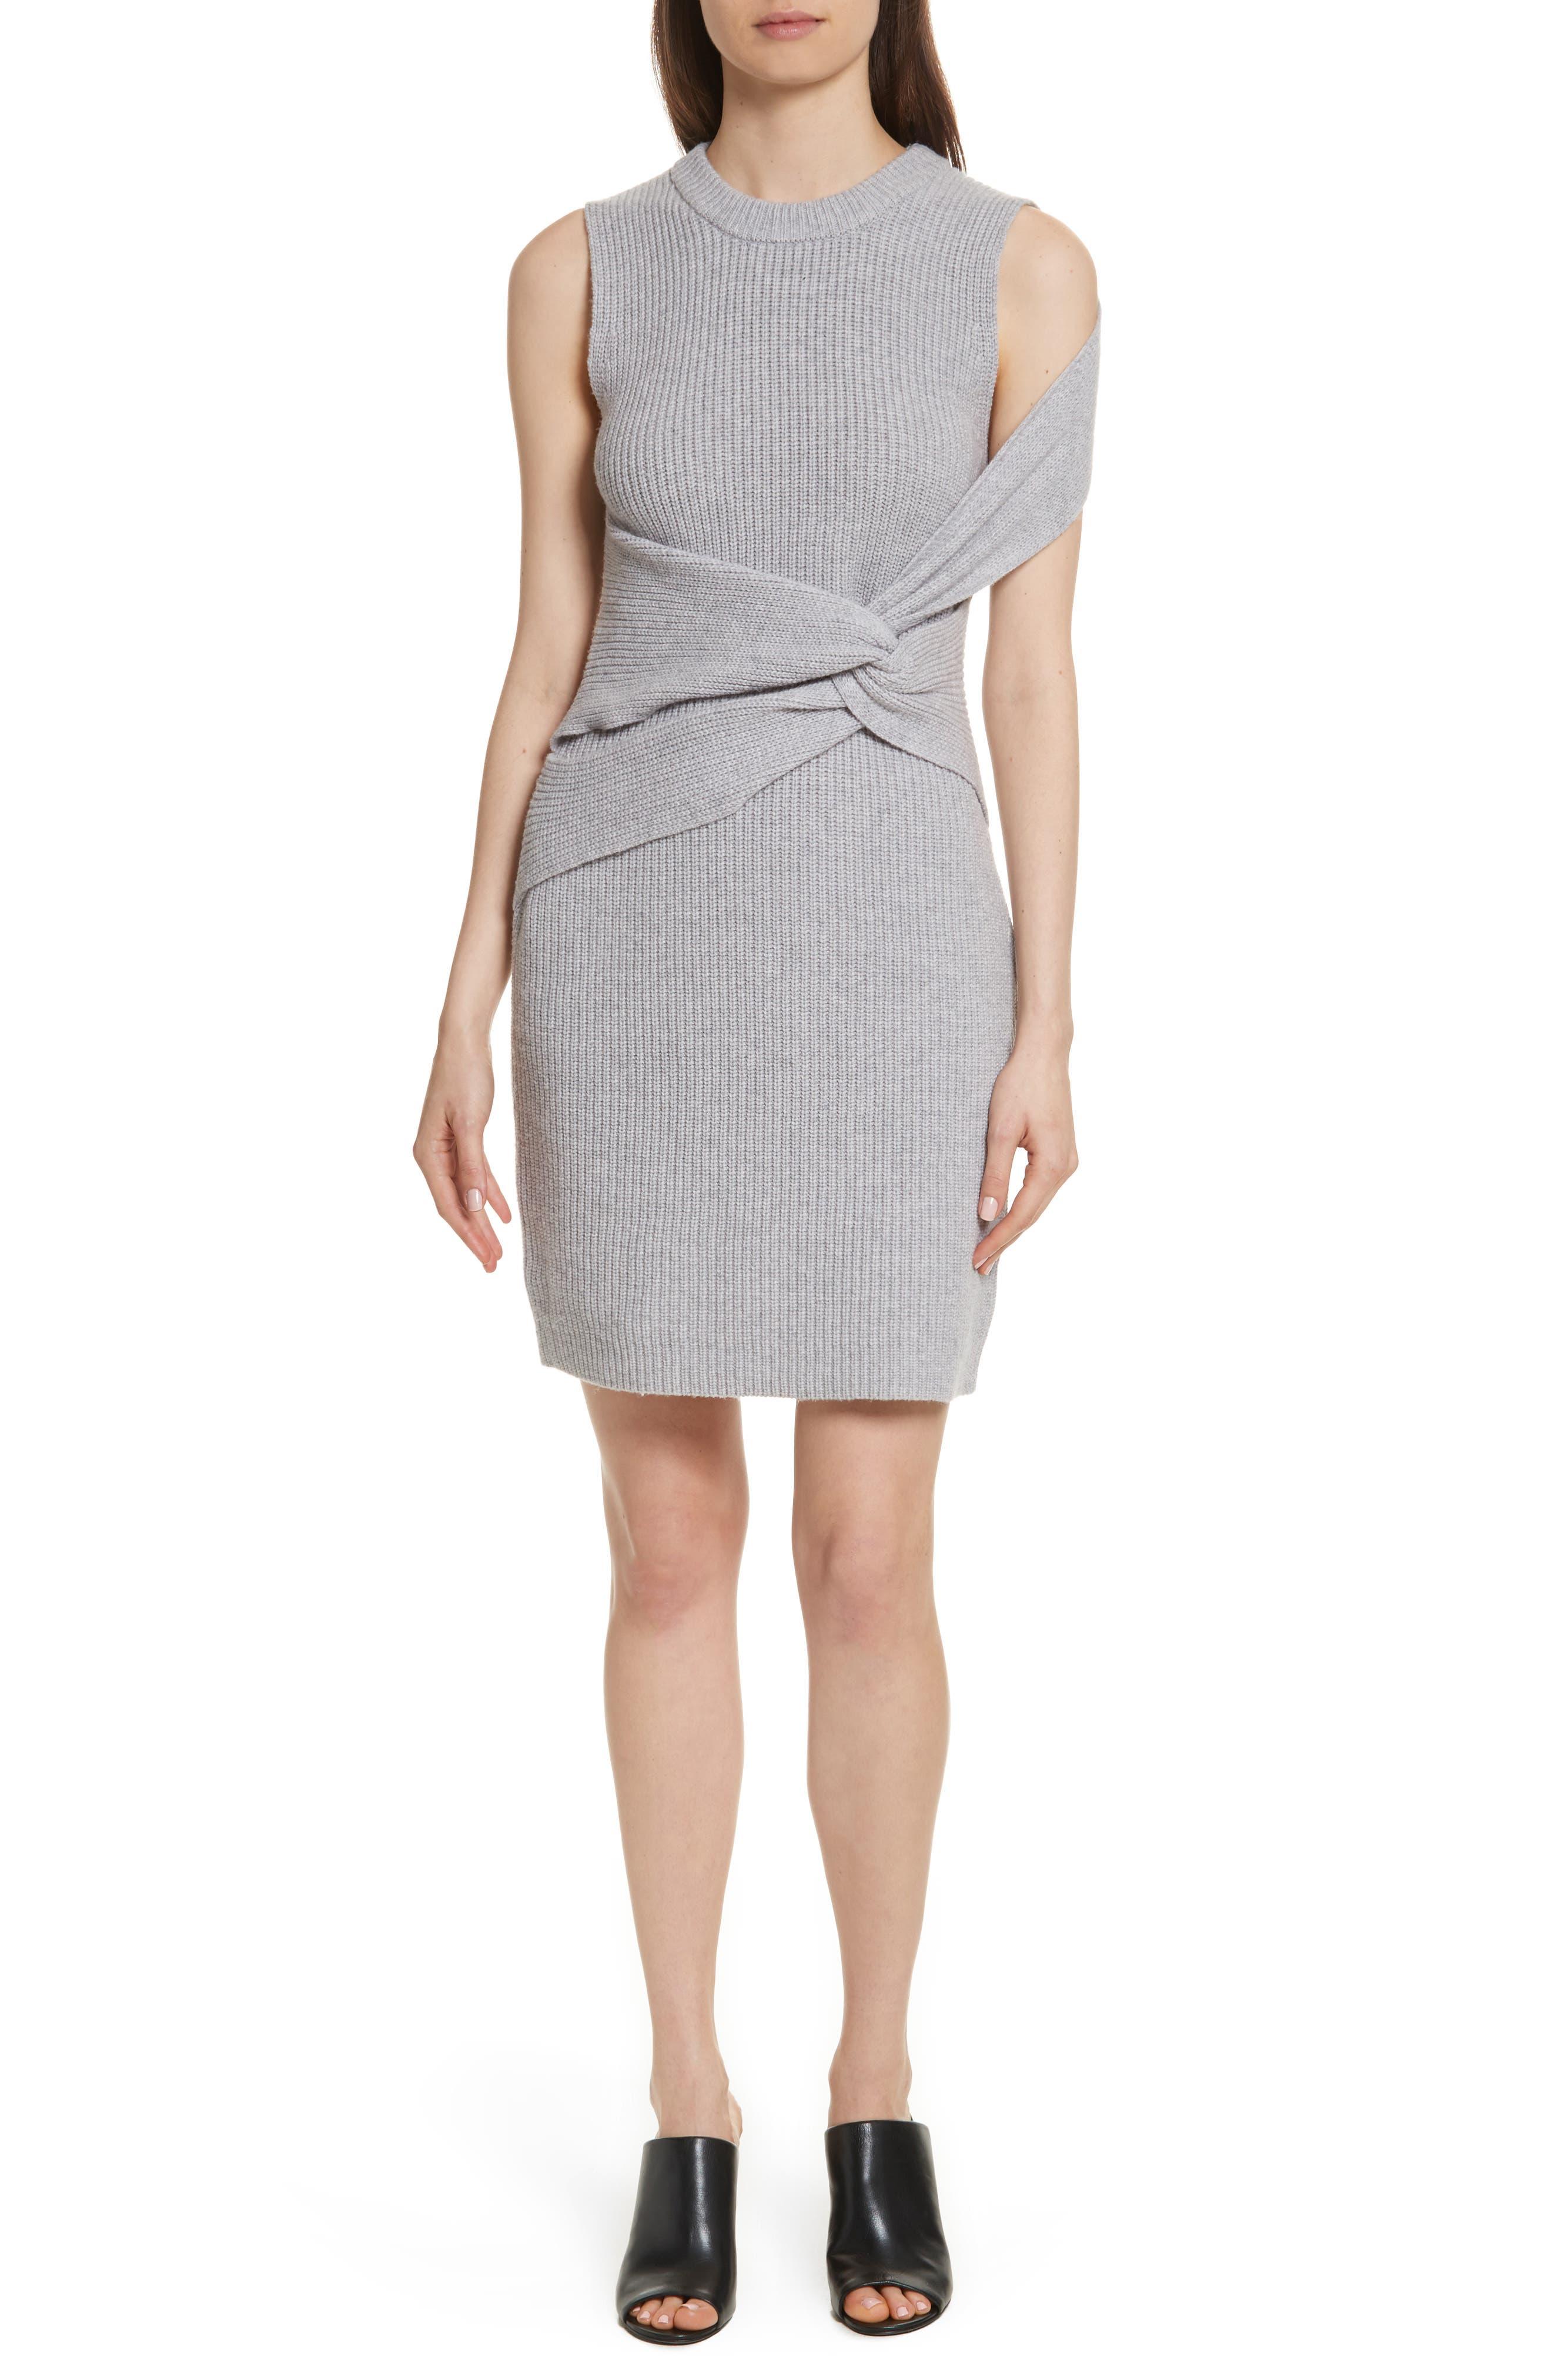 Alternate Image 1 Selected - 3.1 Phillip Lim Twist Knit Dress